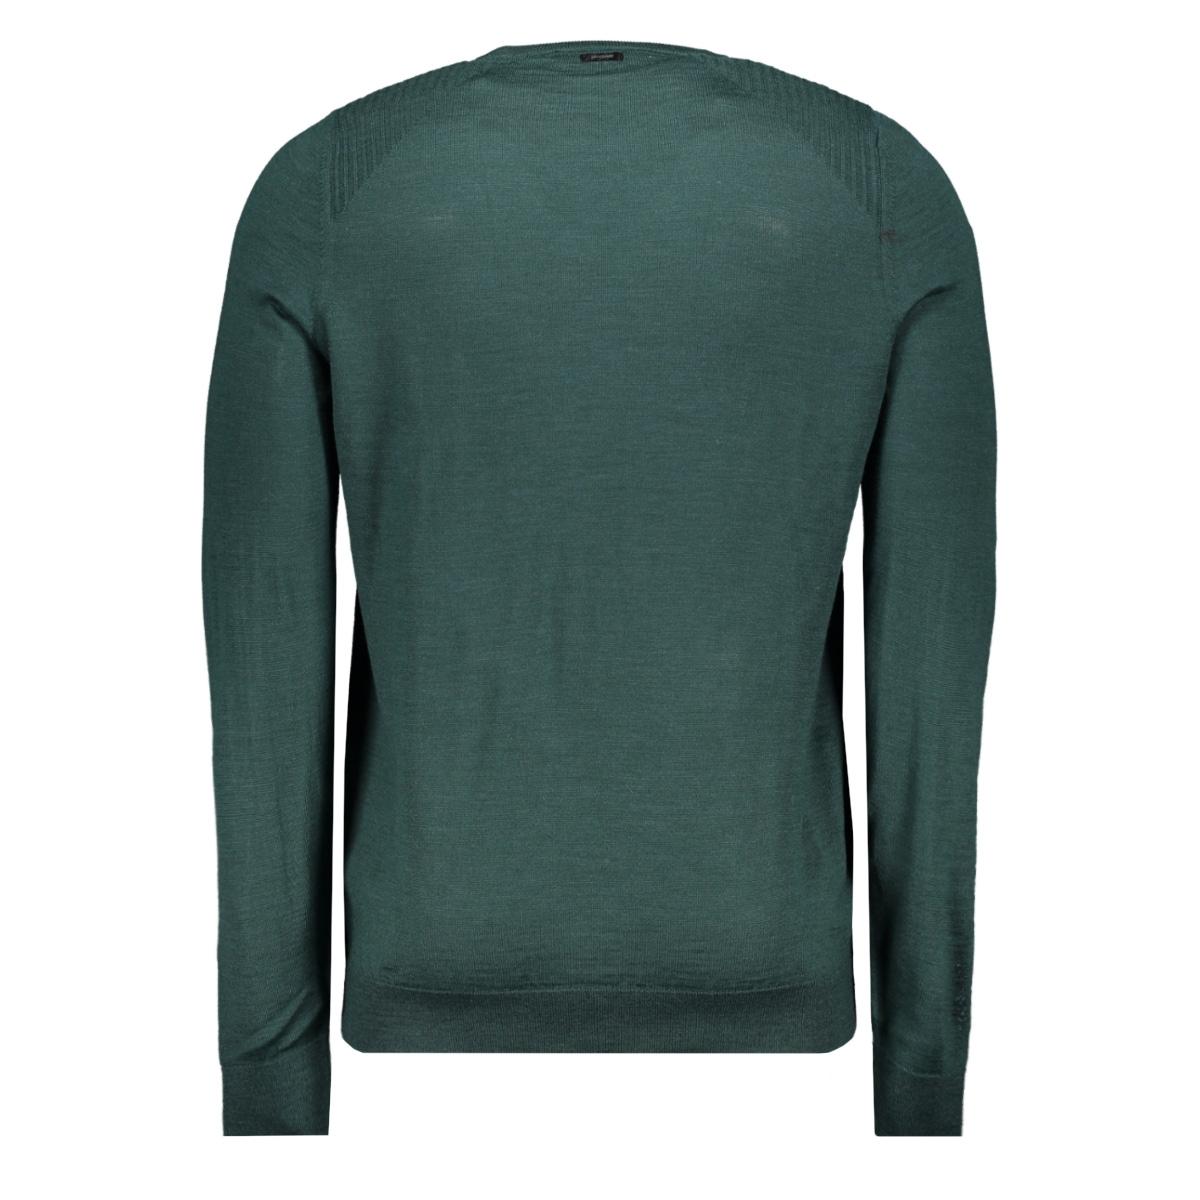 r neck wool vkw196118 vanguard trui 6078